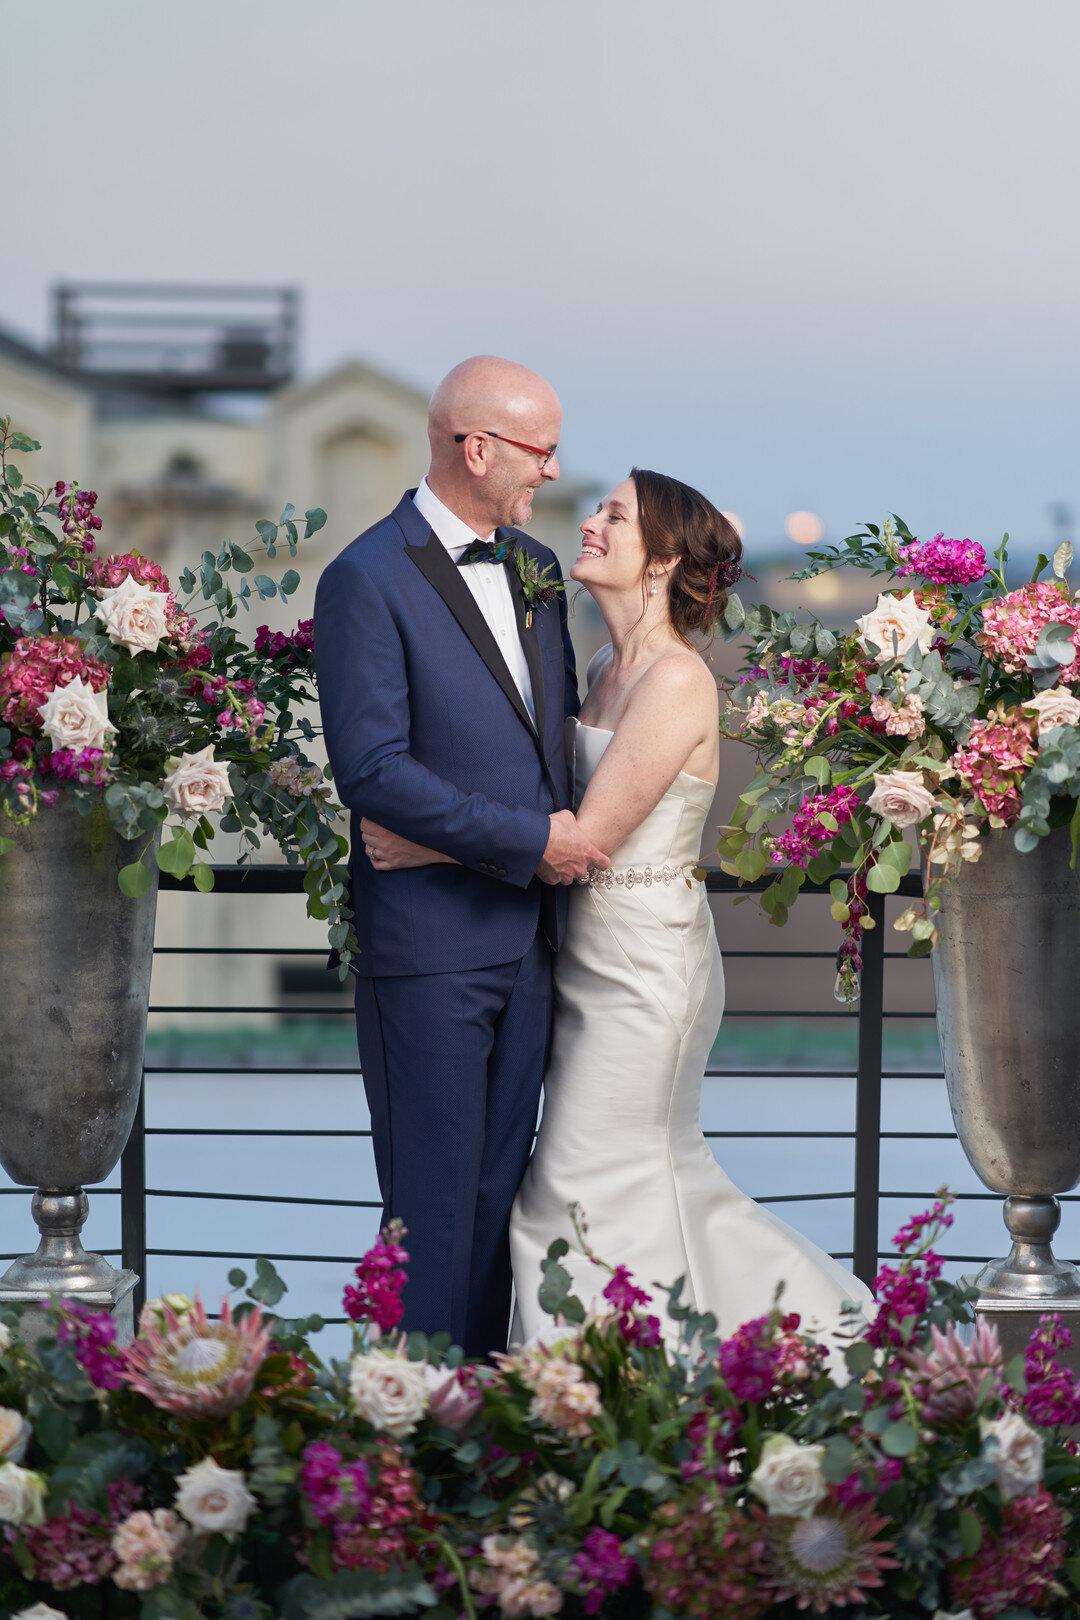 Hollandsworth_Smith_Nicholas Gore Weddings_Final9_big.jpg